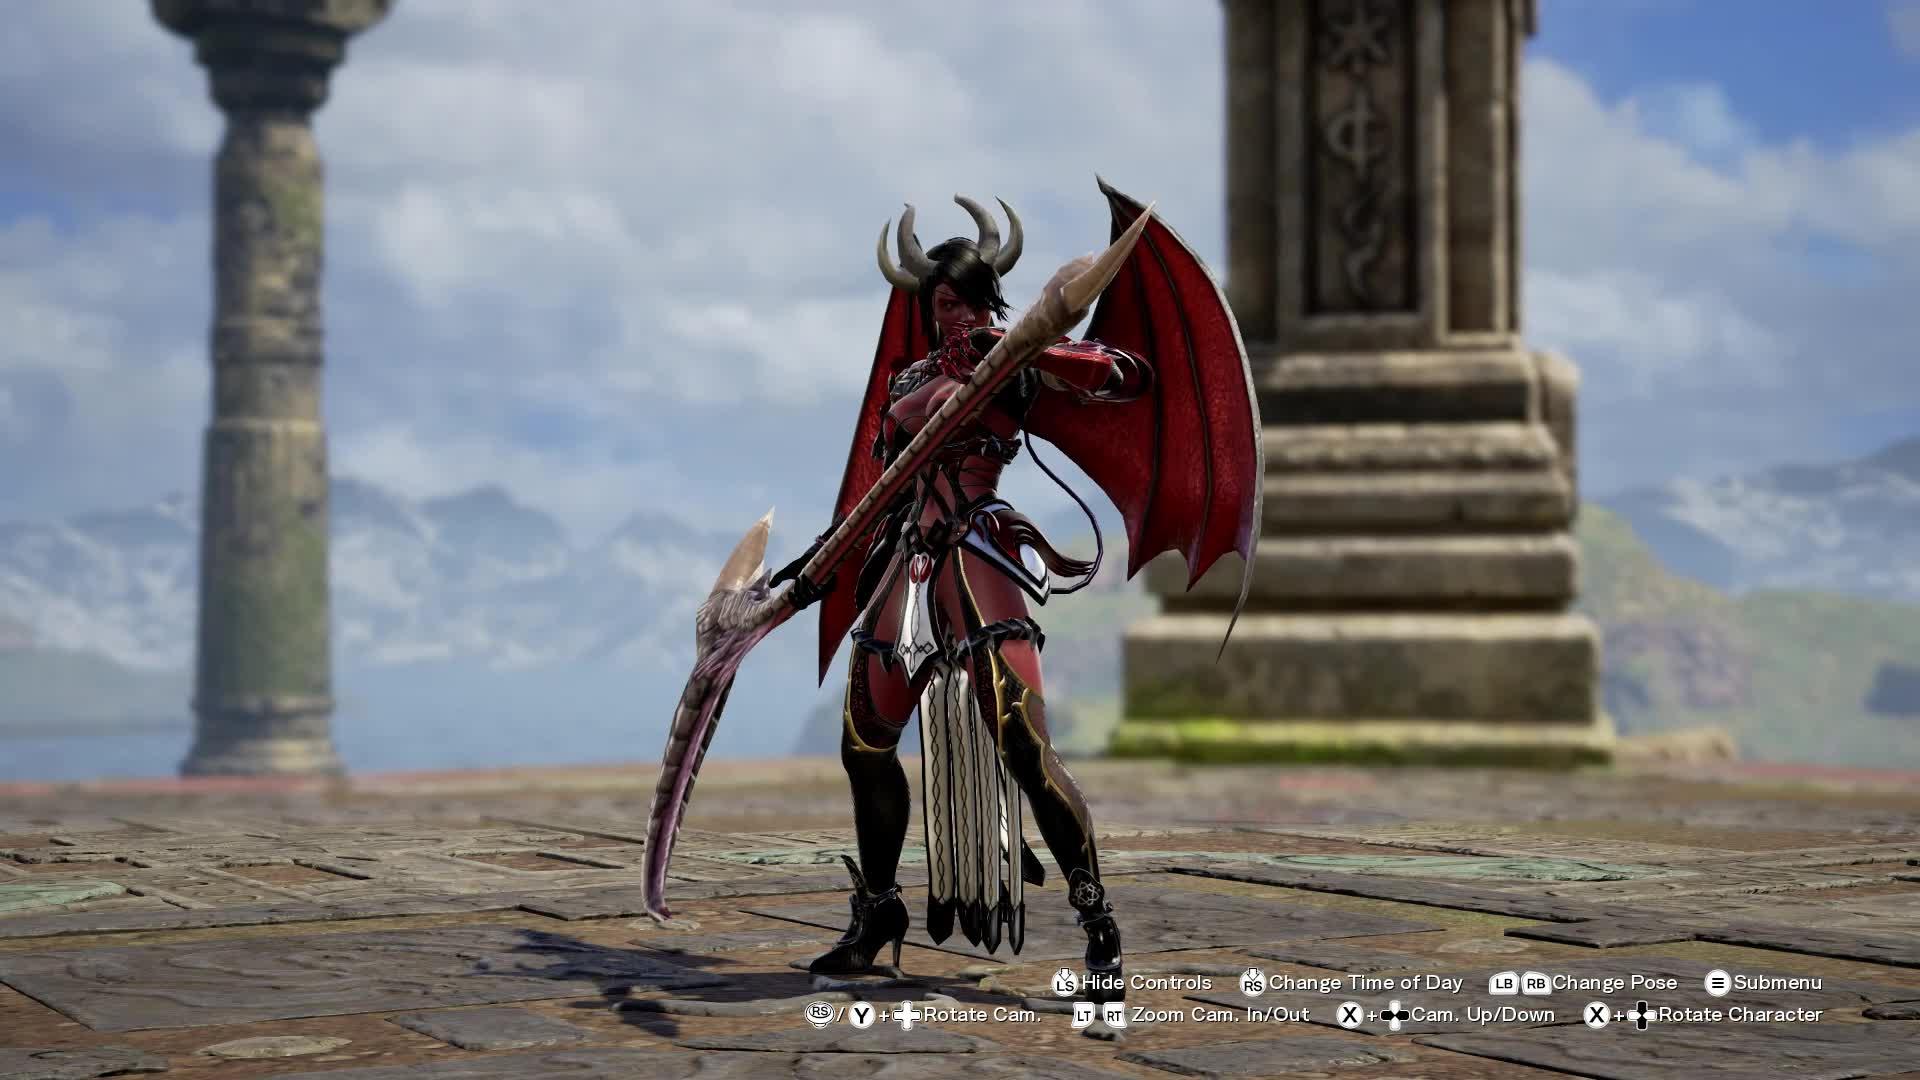 SoulCaliburVI, Demon Character GIFs